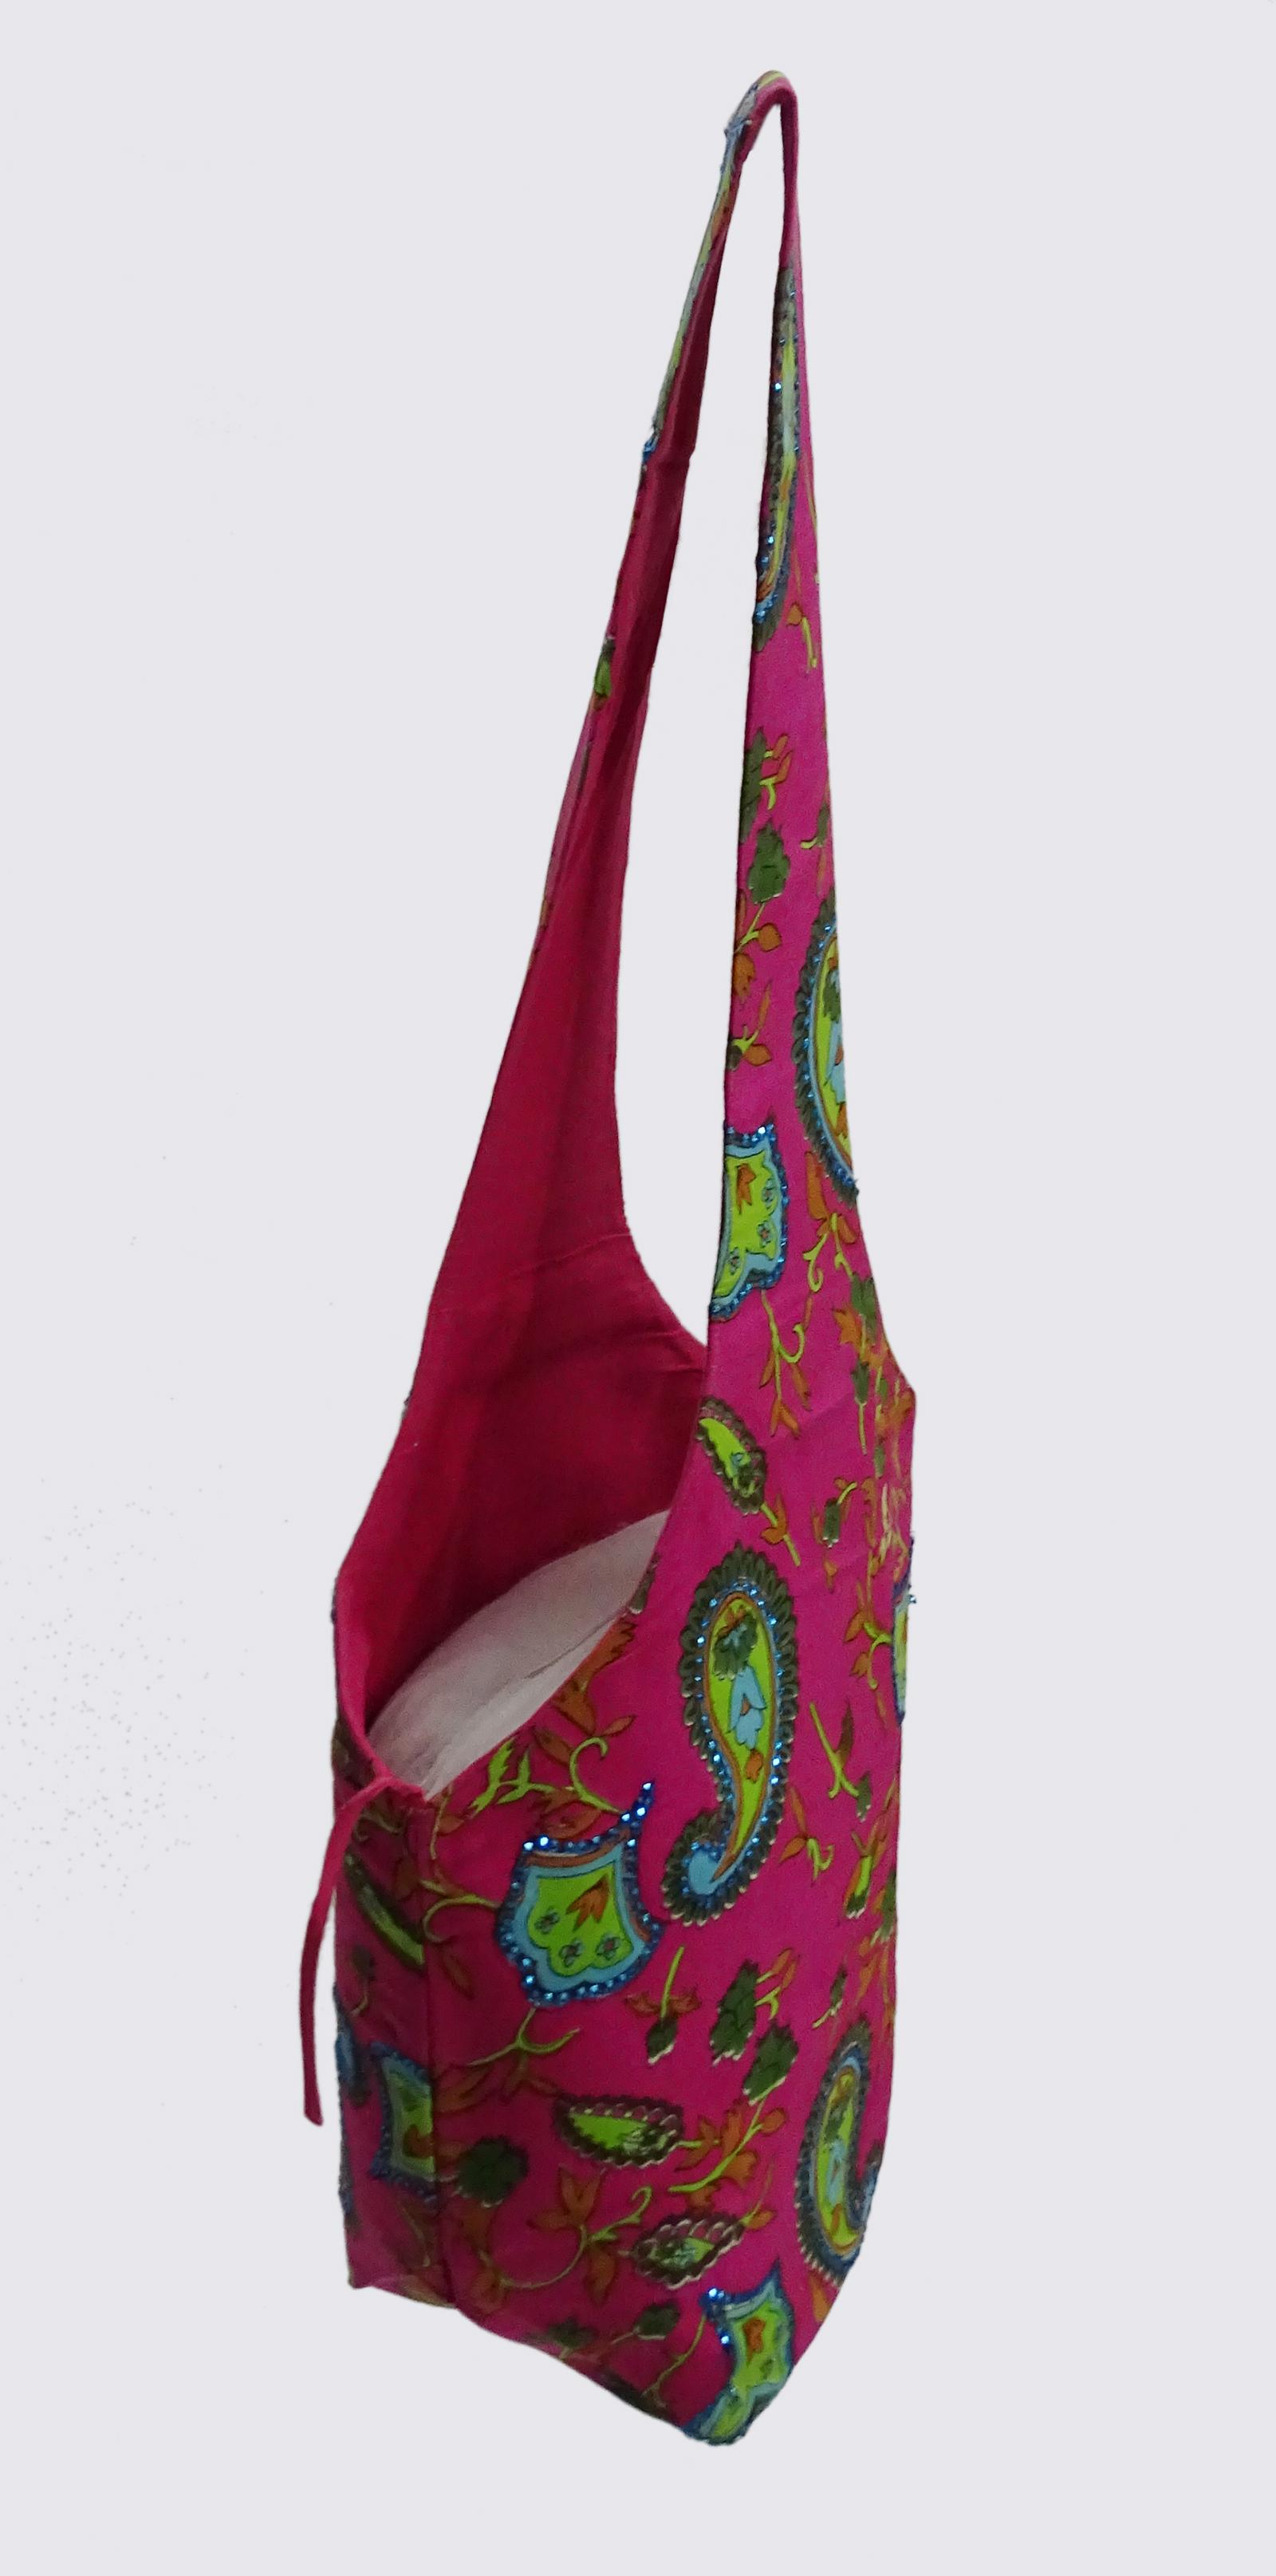 Cotton Patch Bags